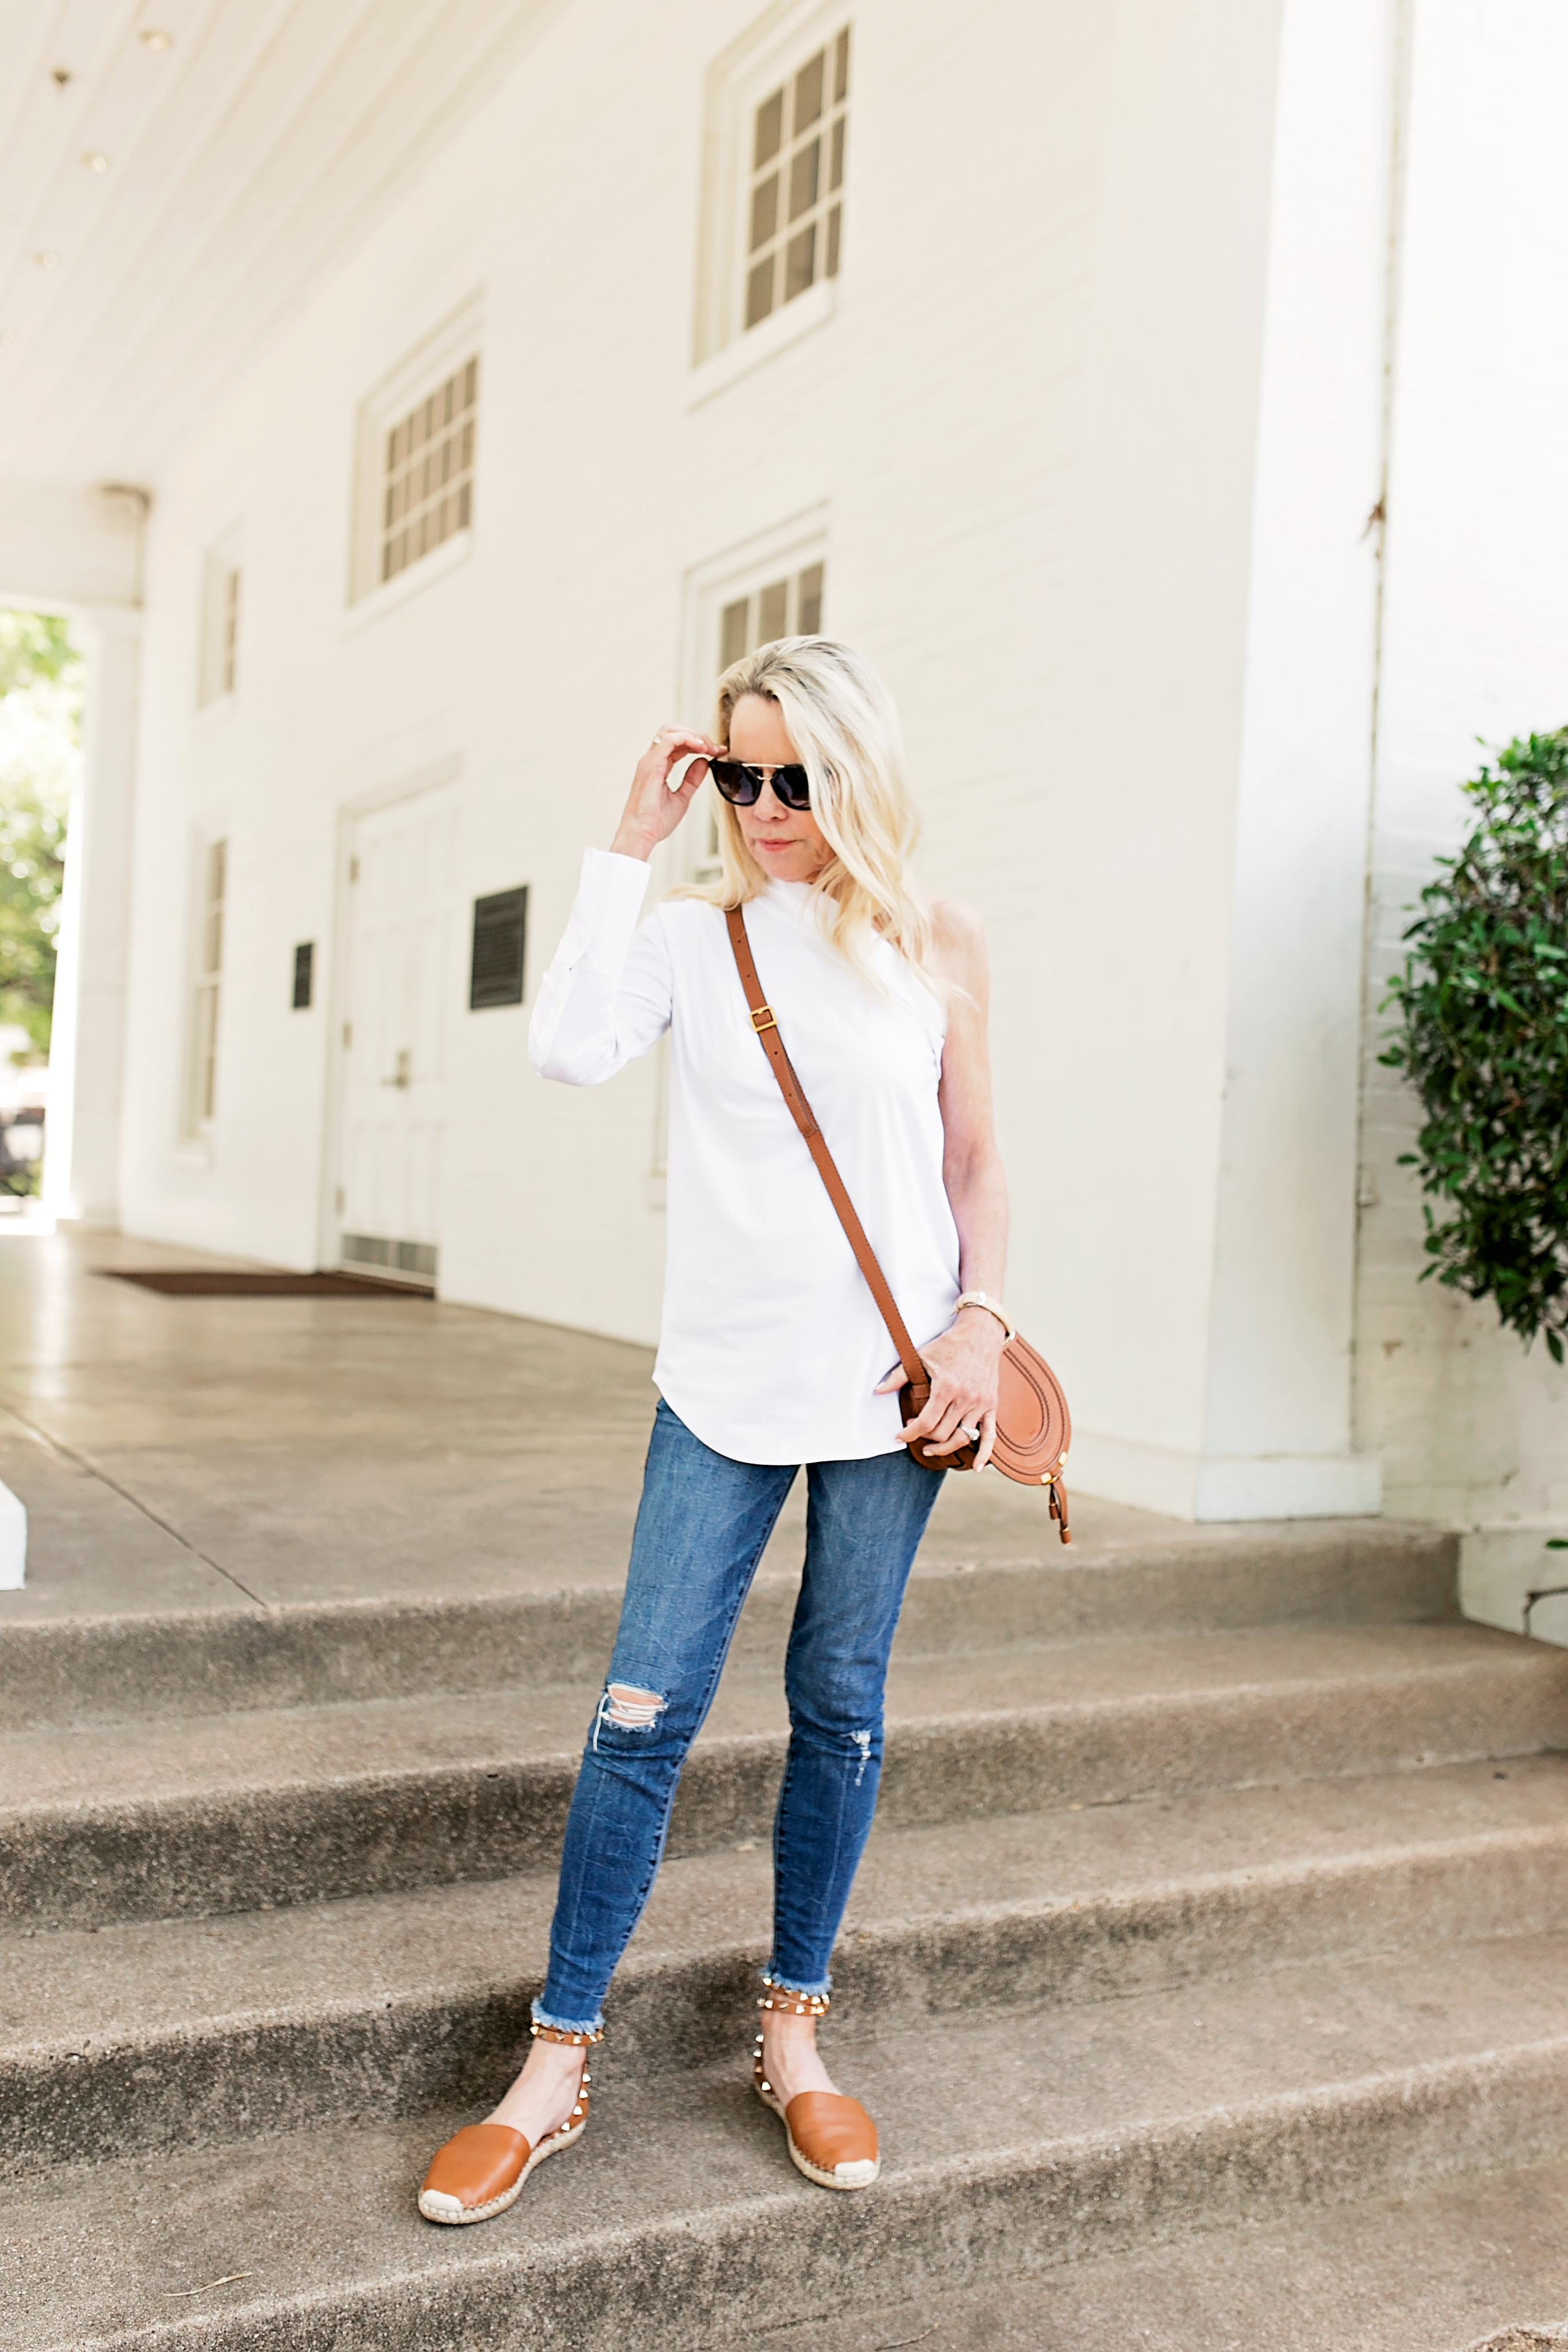 white one shoulder dress shirt brown crassbody handbag distressed jeans